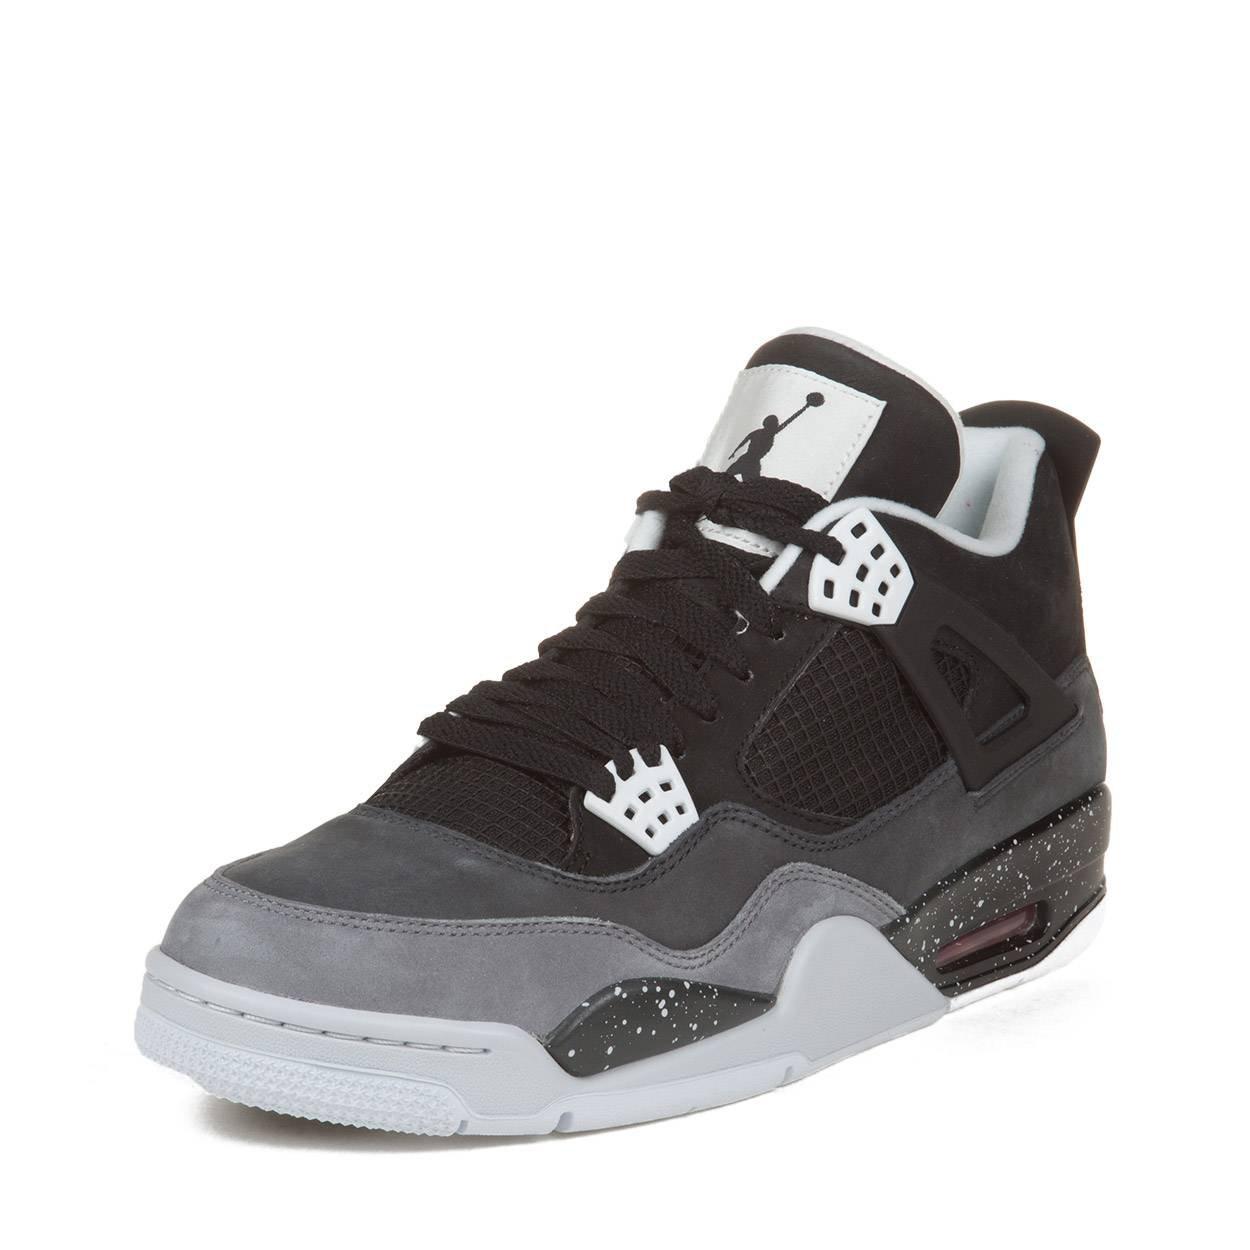 ef3c9169e57f Galleon - NIKE Mens Air Jordan 4 Retro Fear Pack Black Cool Grey Suede  Basketball Shoes Size 10.5